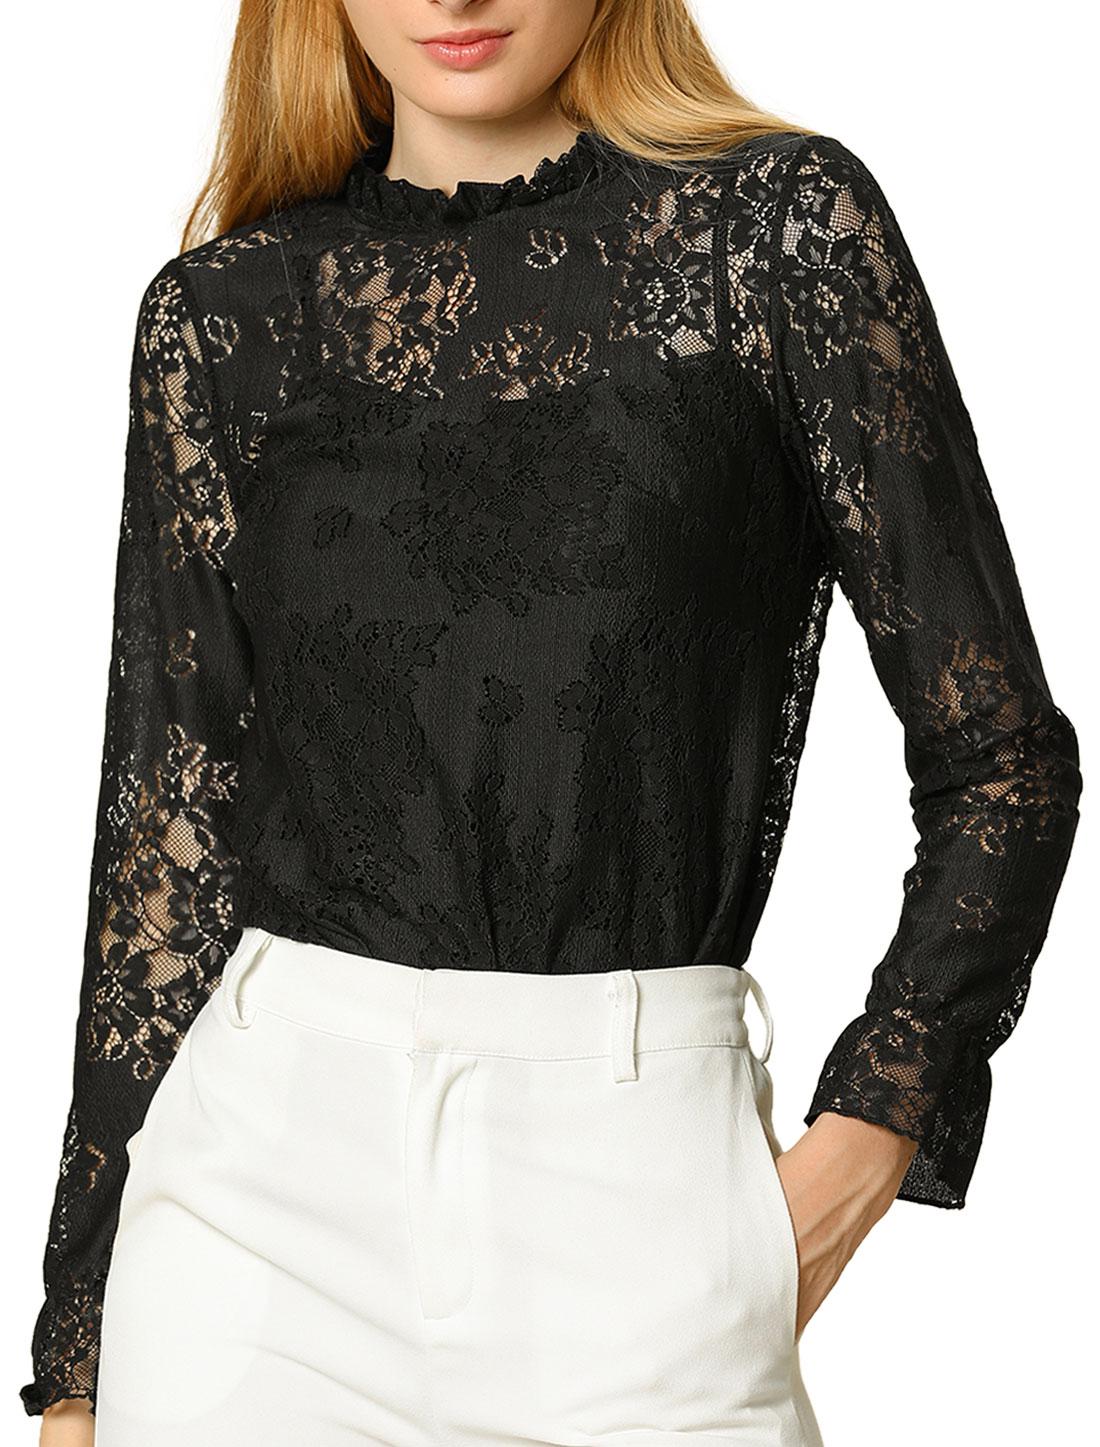 Allegra K Womens Lace Sheer Floral Color Block Blouse Black S (US 6)